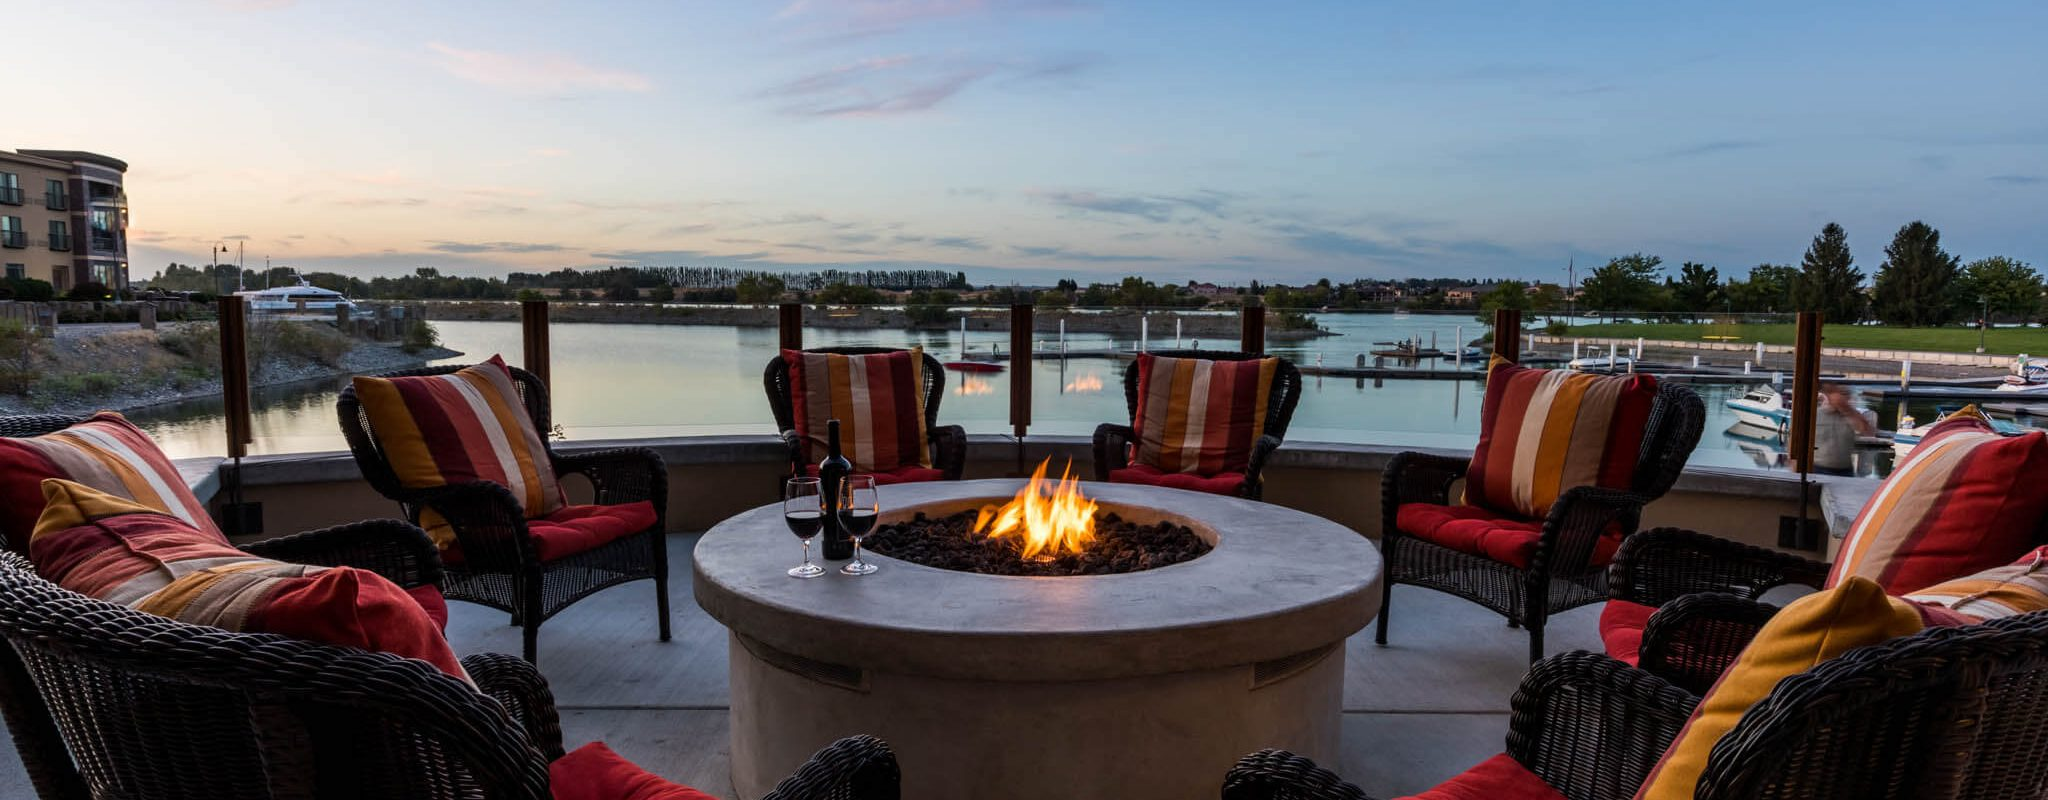 Fireside evening in Richland, Washington